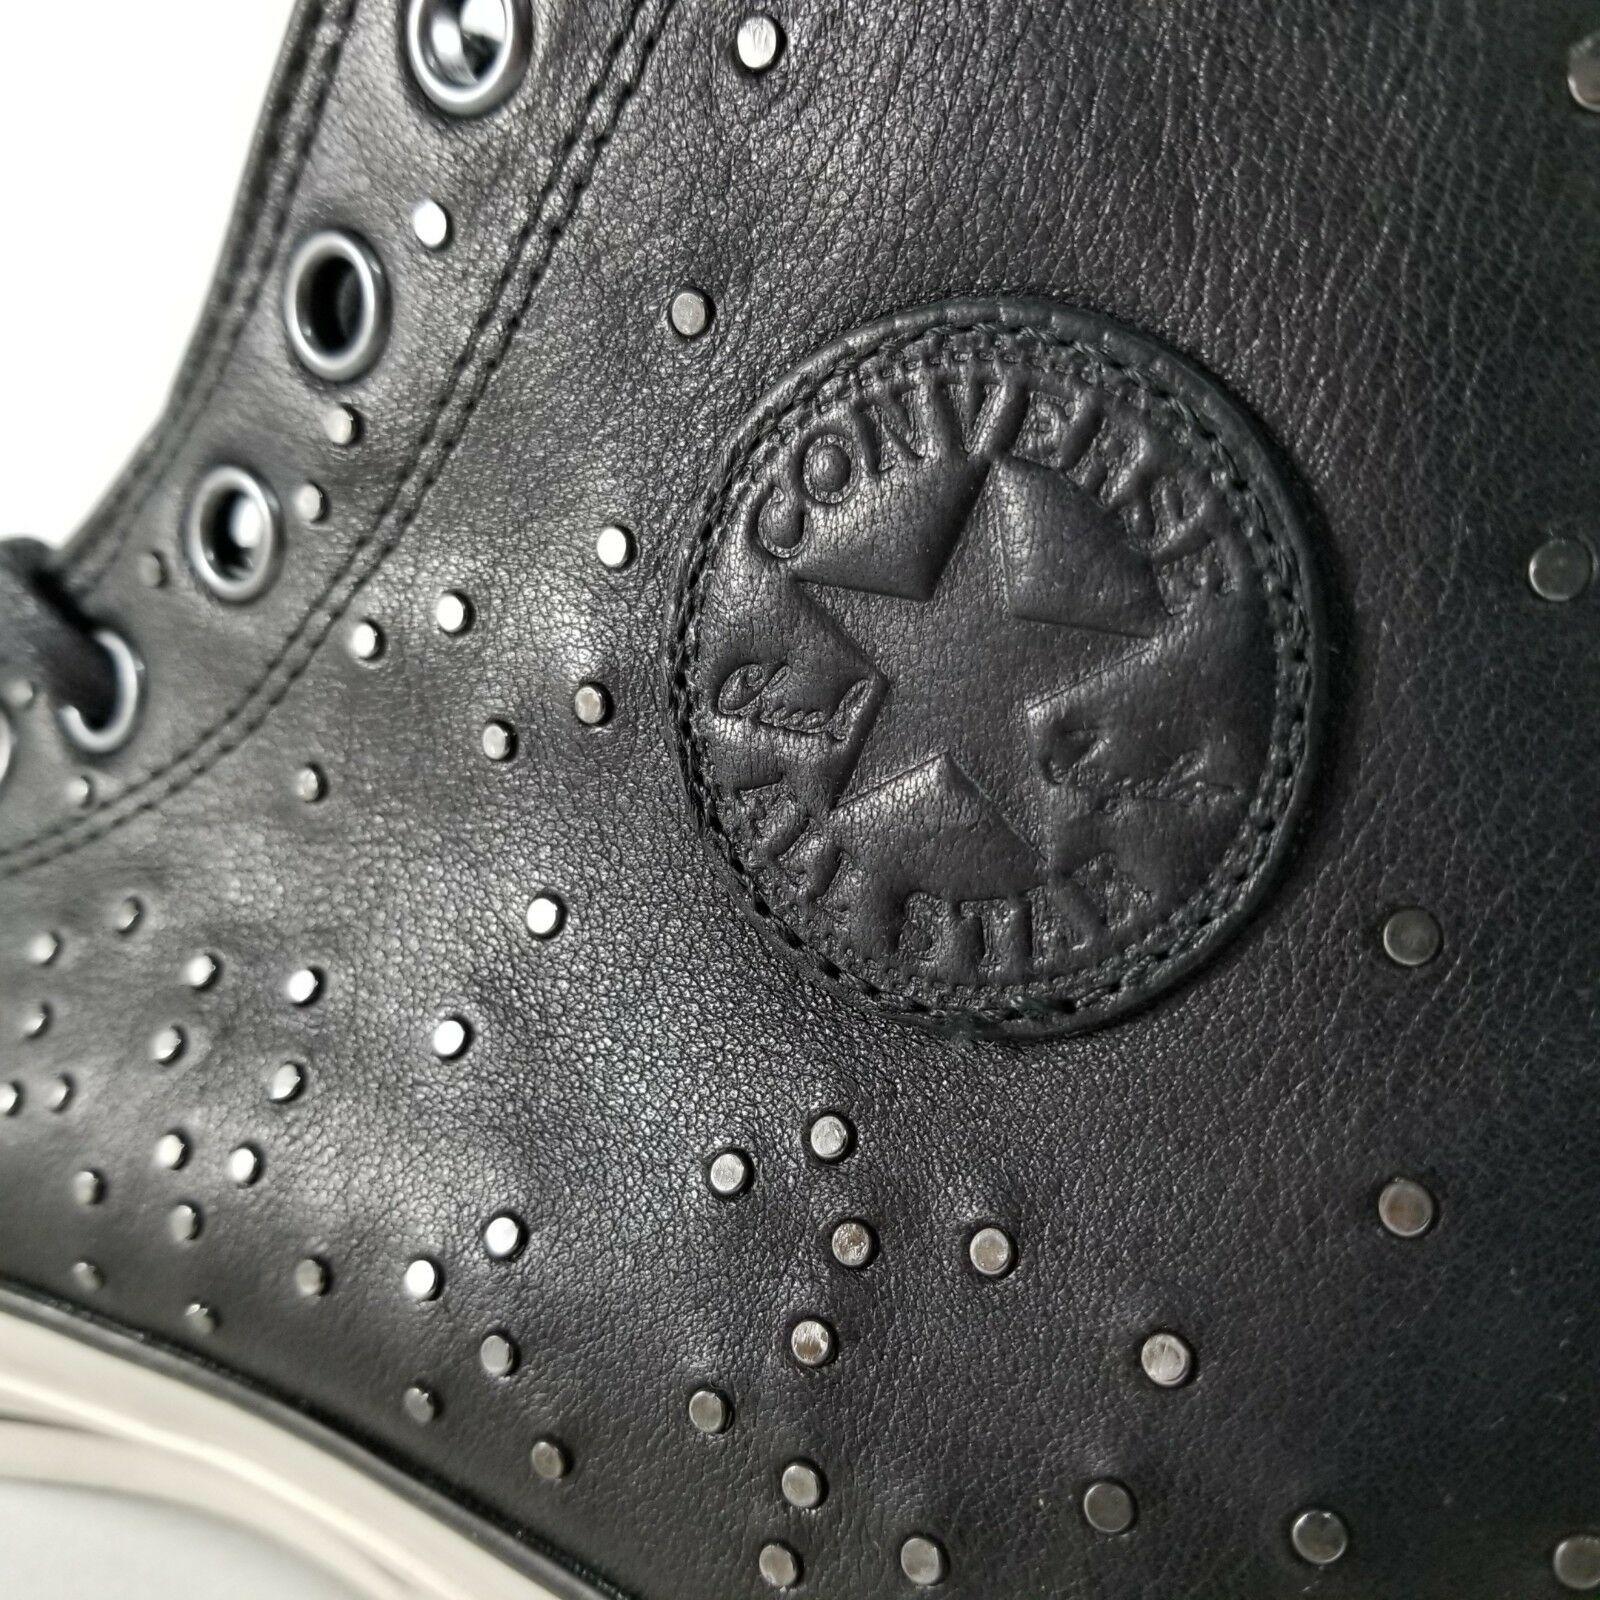 Converse X John Varvatos CTAS Mini Stud Hi Shoes Size 10.5 Mens Sneakers Black